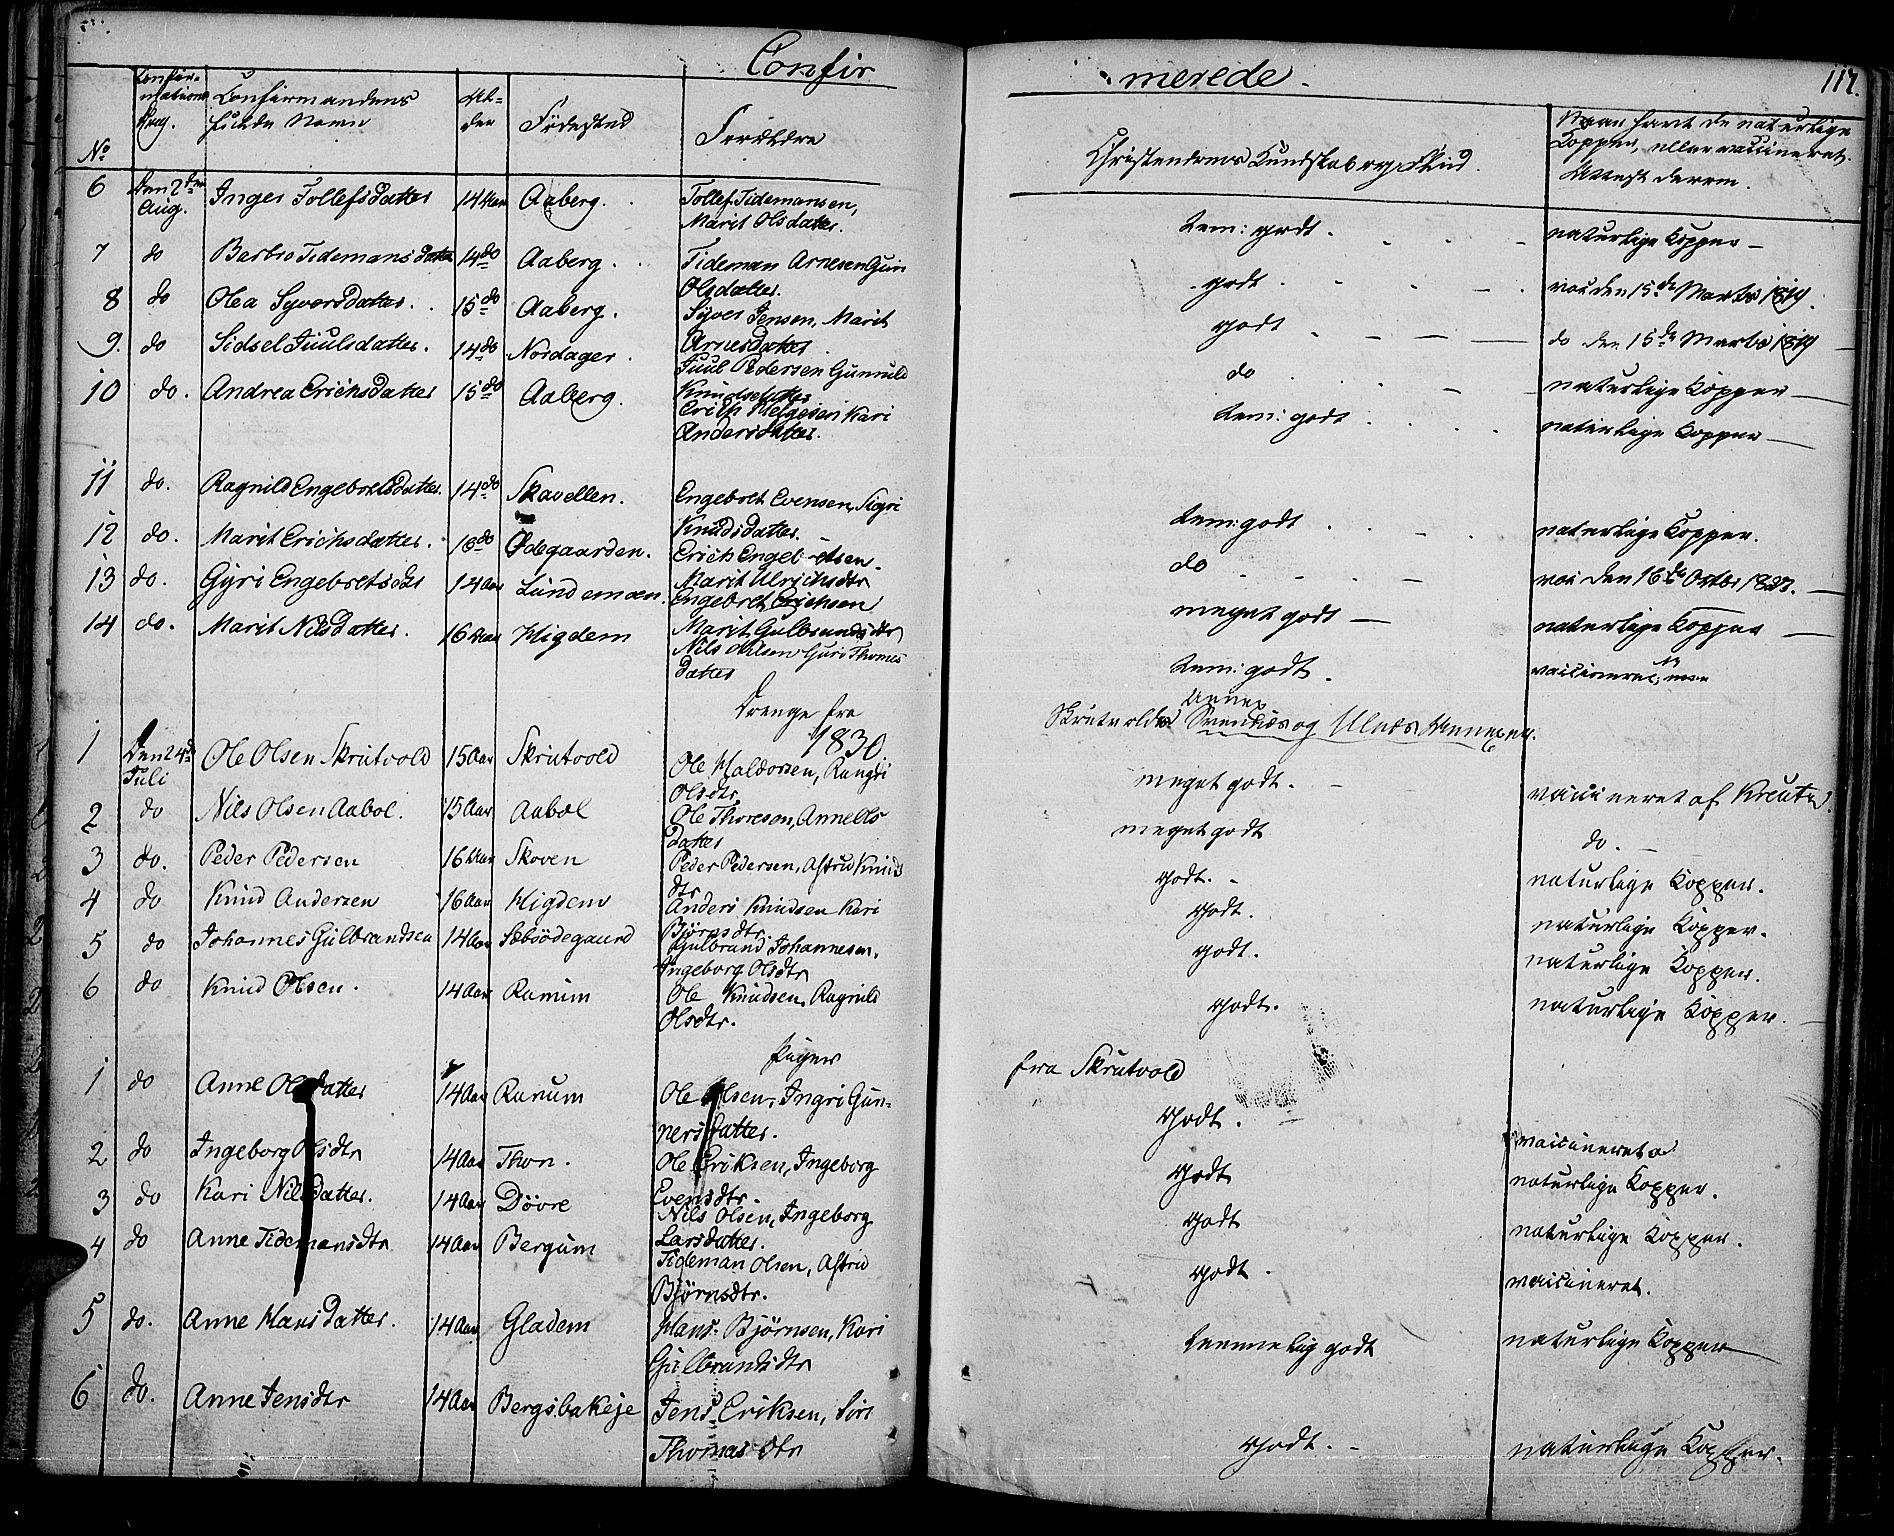 SAH, Nord-Aurdal prestekontor, Ministerialbok nr. 3, 1828-1841, s. 117